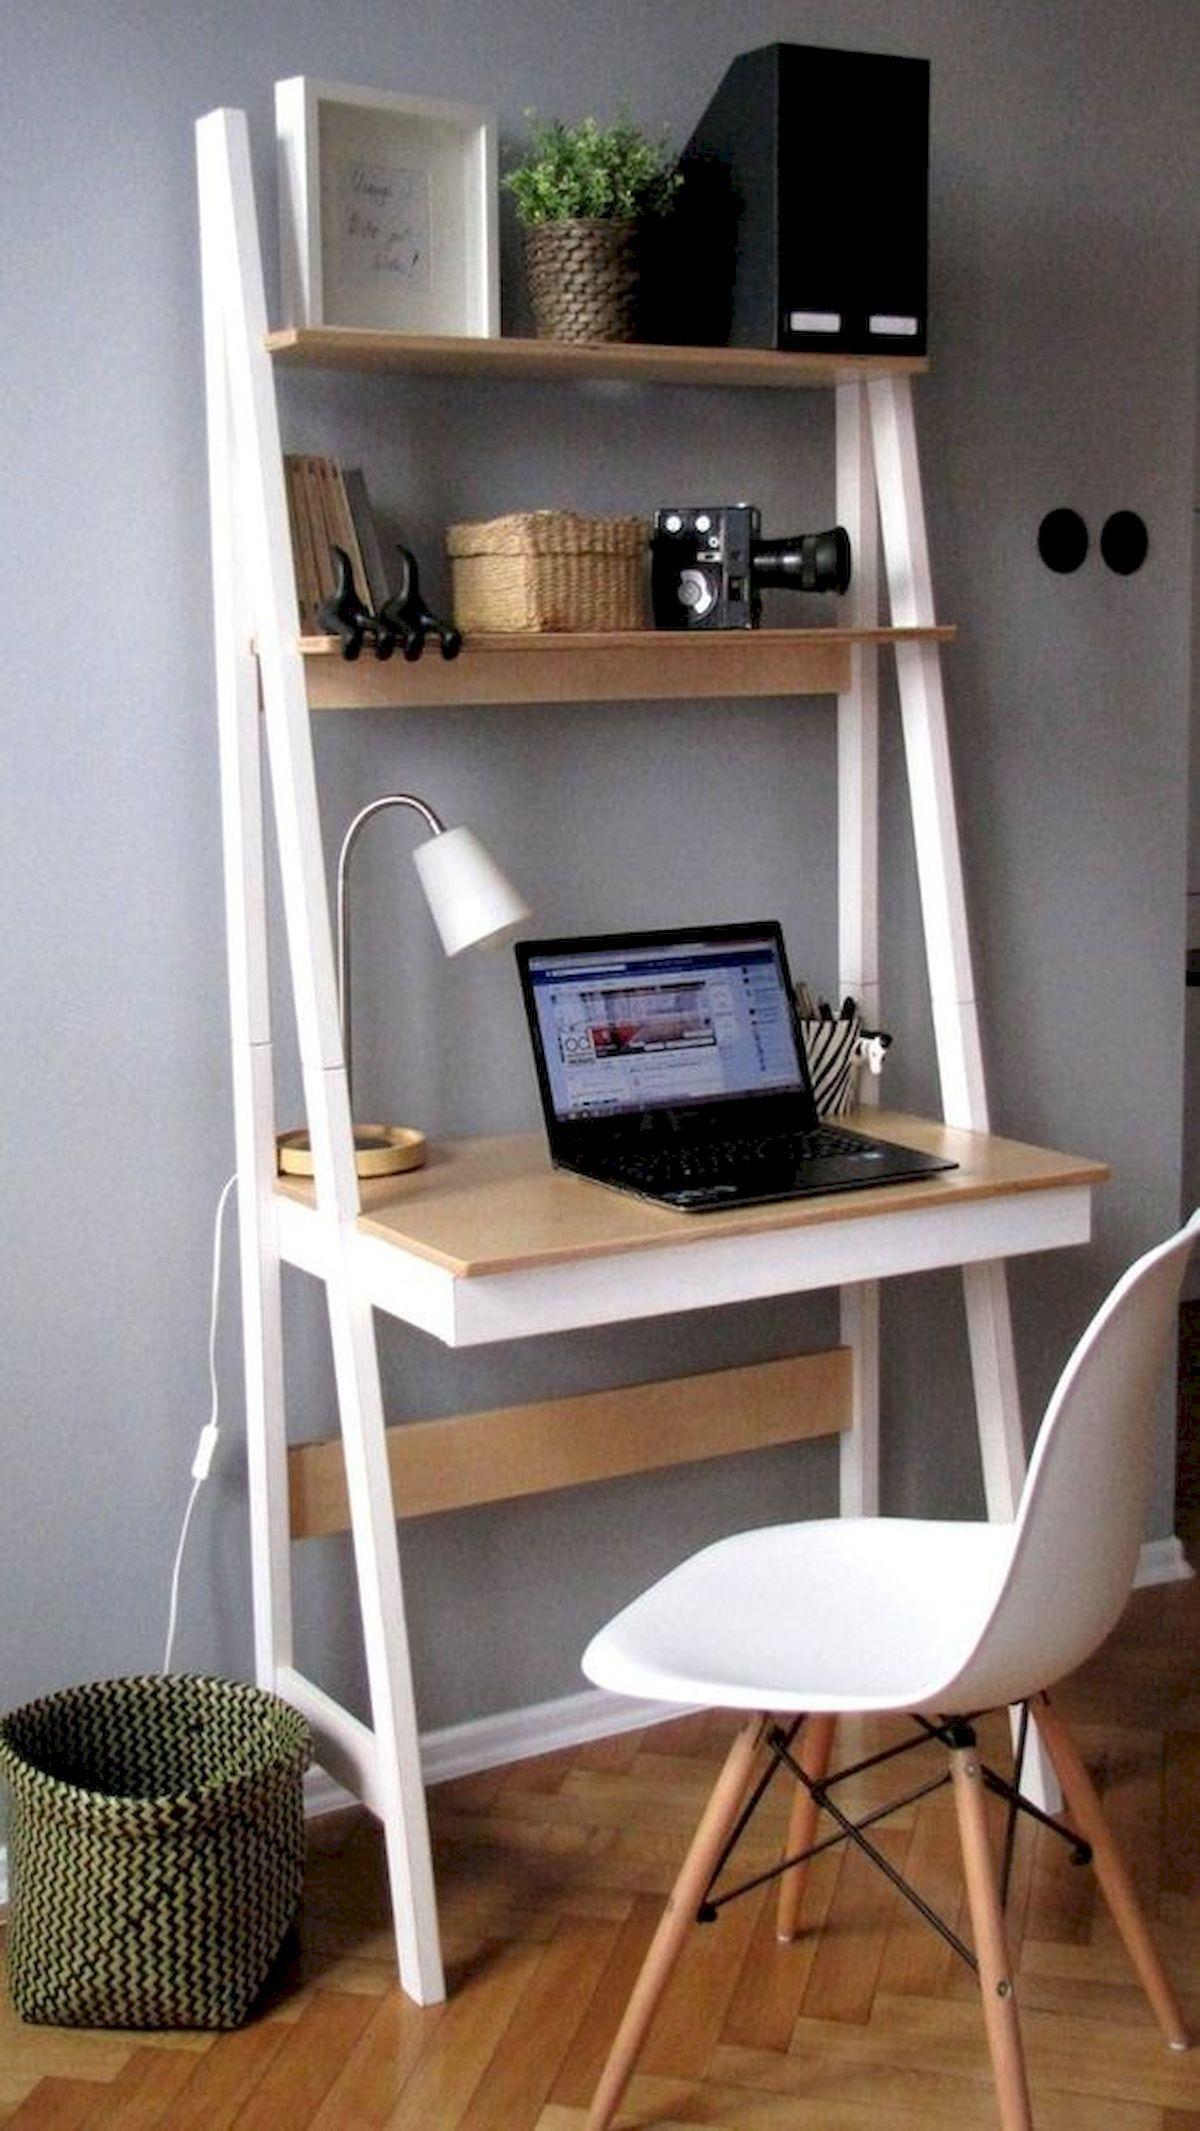 55 Stunning Small Apartment Decorating Ideas Small Home Offices Small Apartment Decorating Home Office Decor